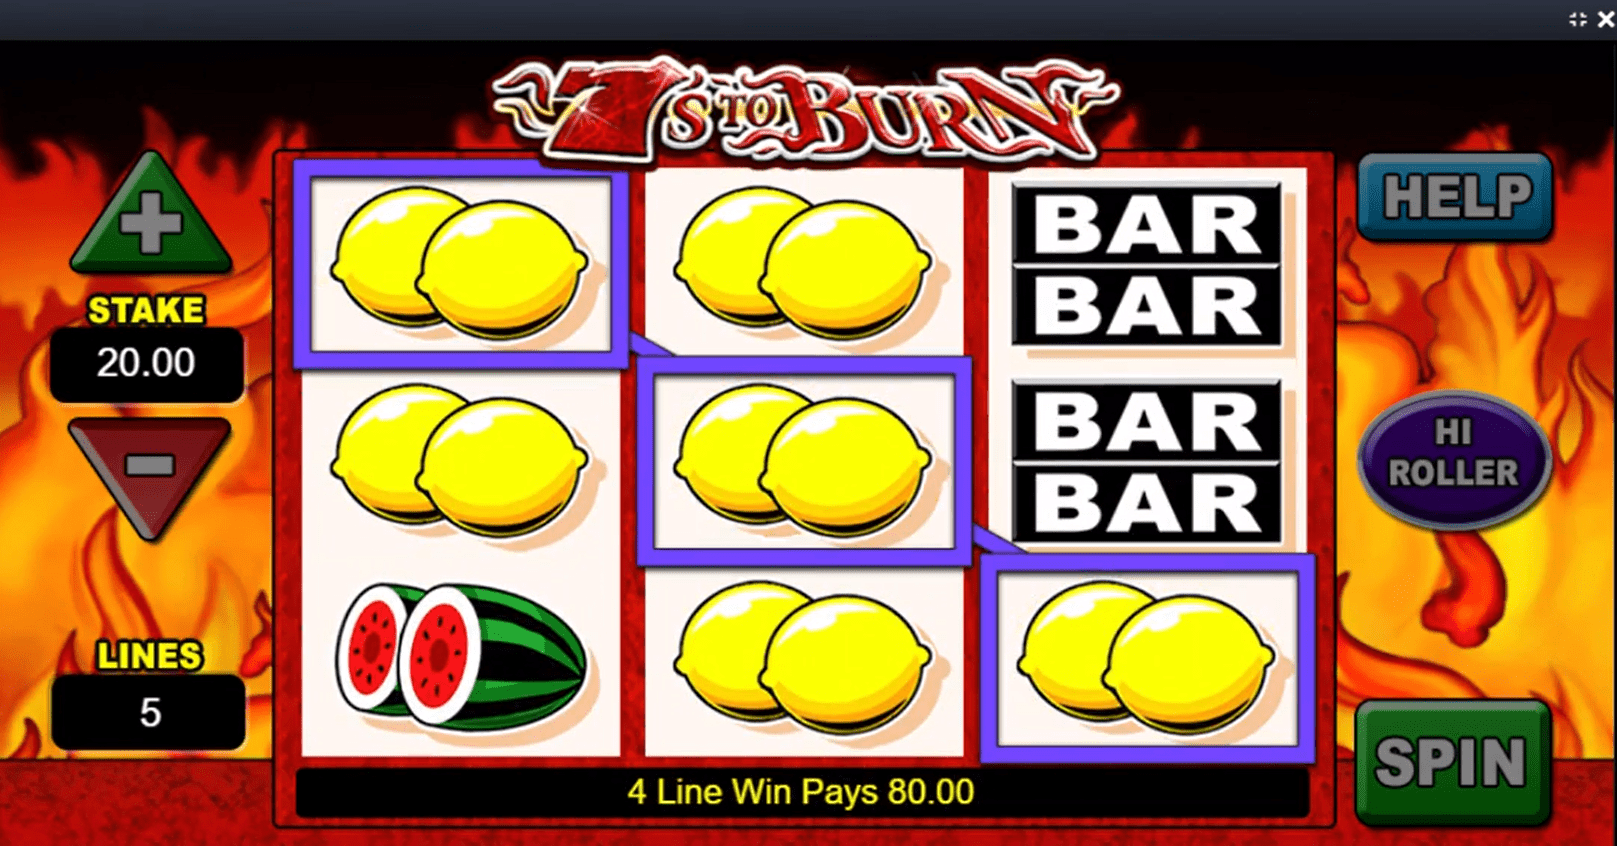 7s to Burn Slots Win